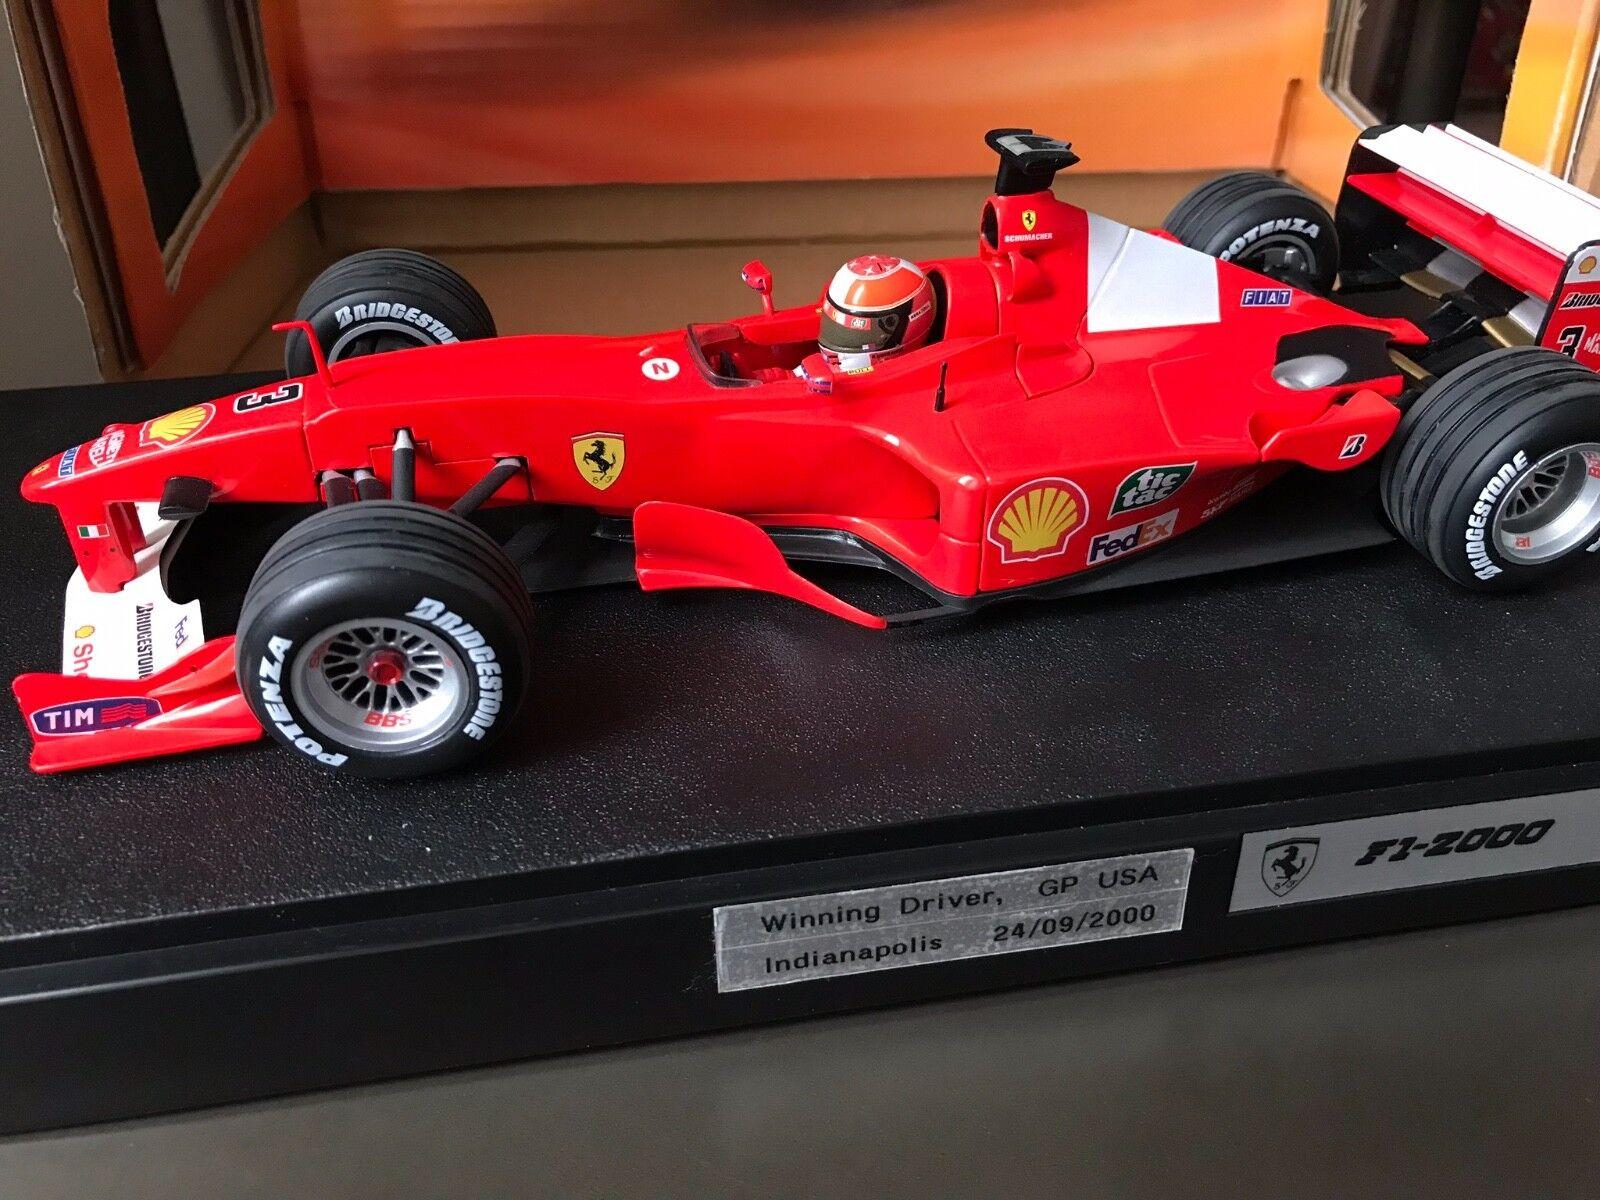 F1 Ferrari F2000, SCHUMACHER, 1 18 comme neuf avec boite d'origine